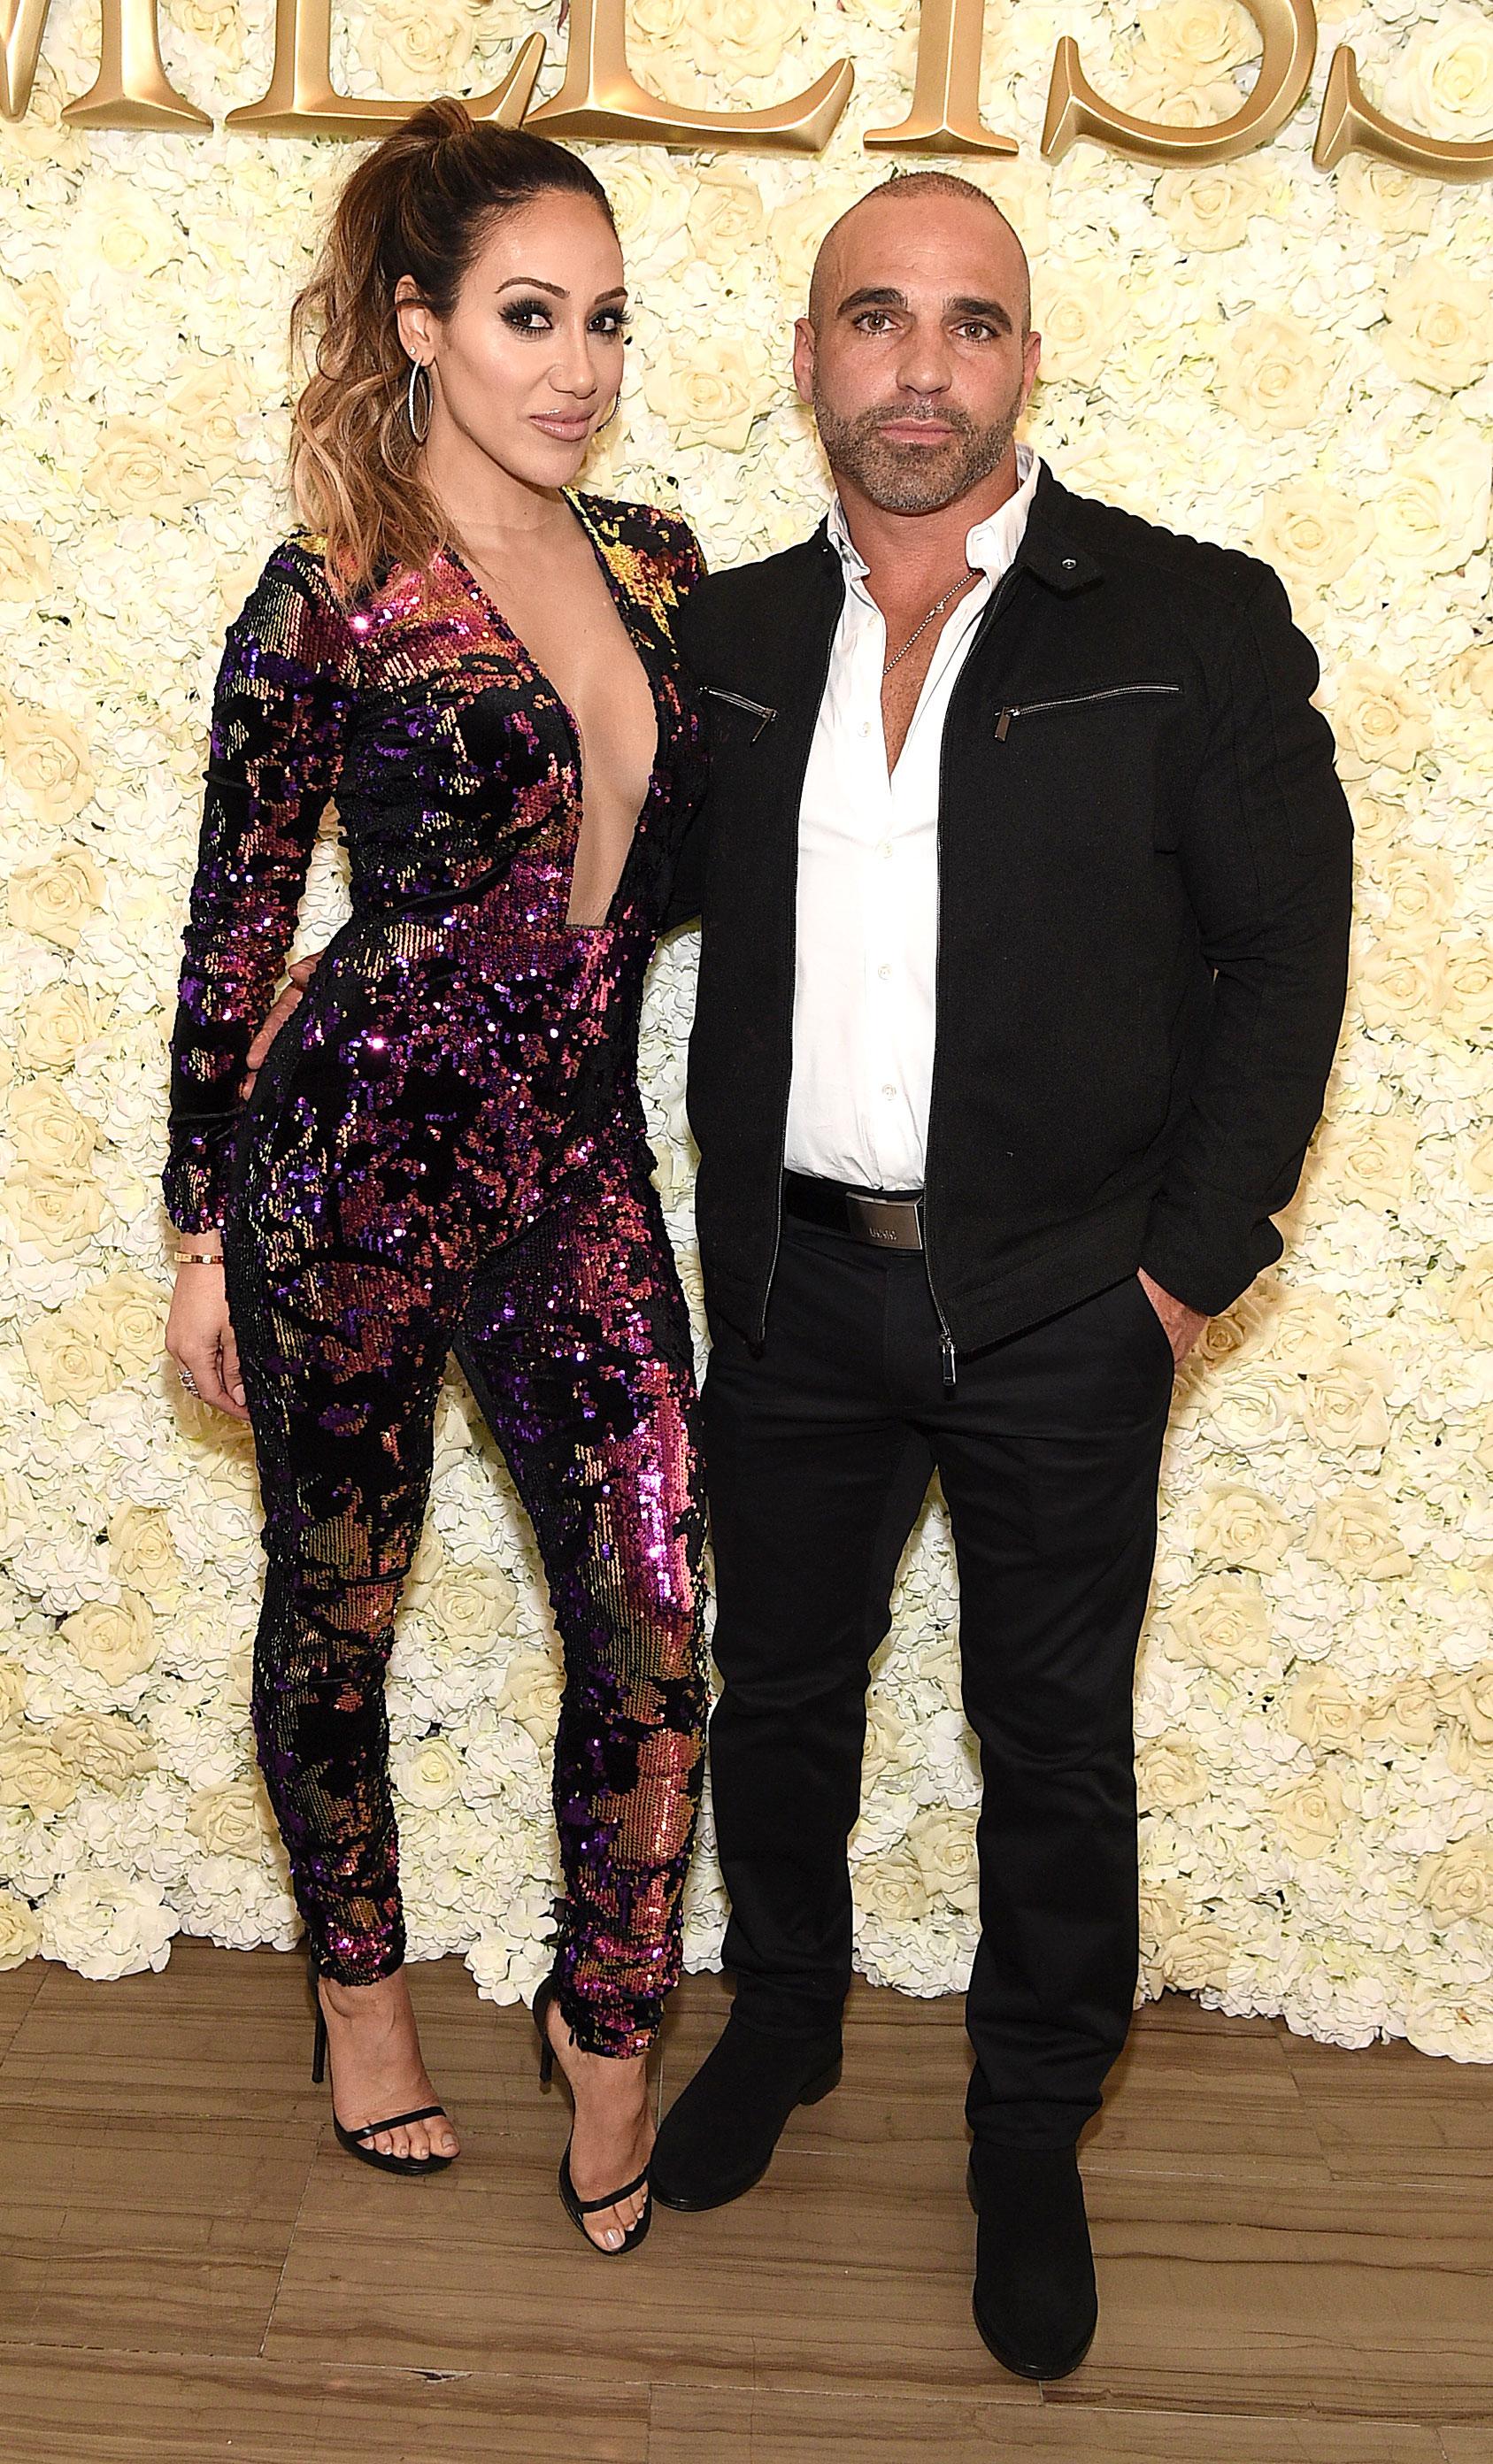 Melissa and Joe Gorga Shade Danielle Staub's 21st Engagement - Melissa Gorga and Joe Gorga attend Melissa Gorga's 40th Birthday at Tribeca 360 on March 28, 2019 in New York City.